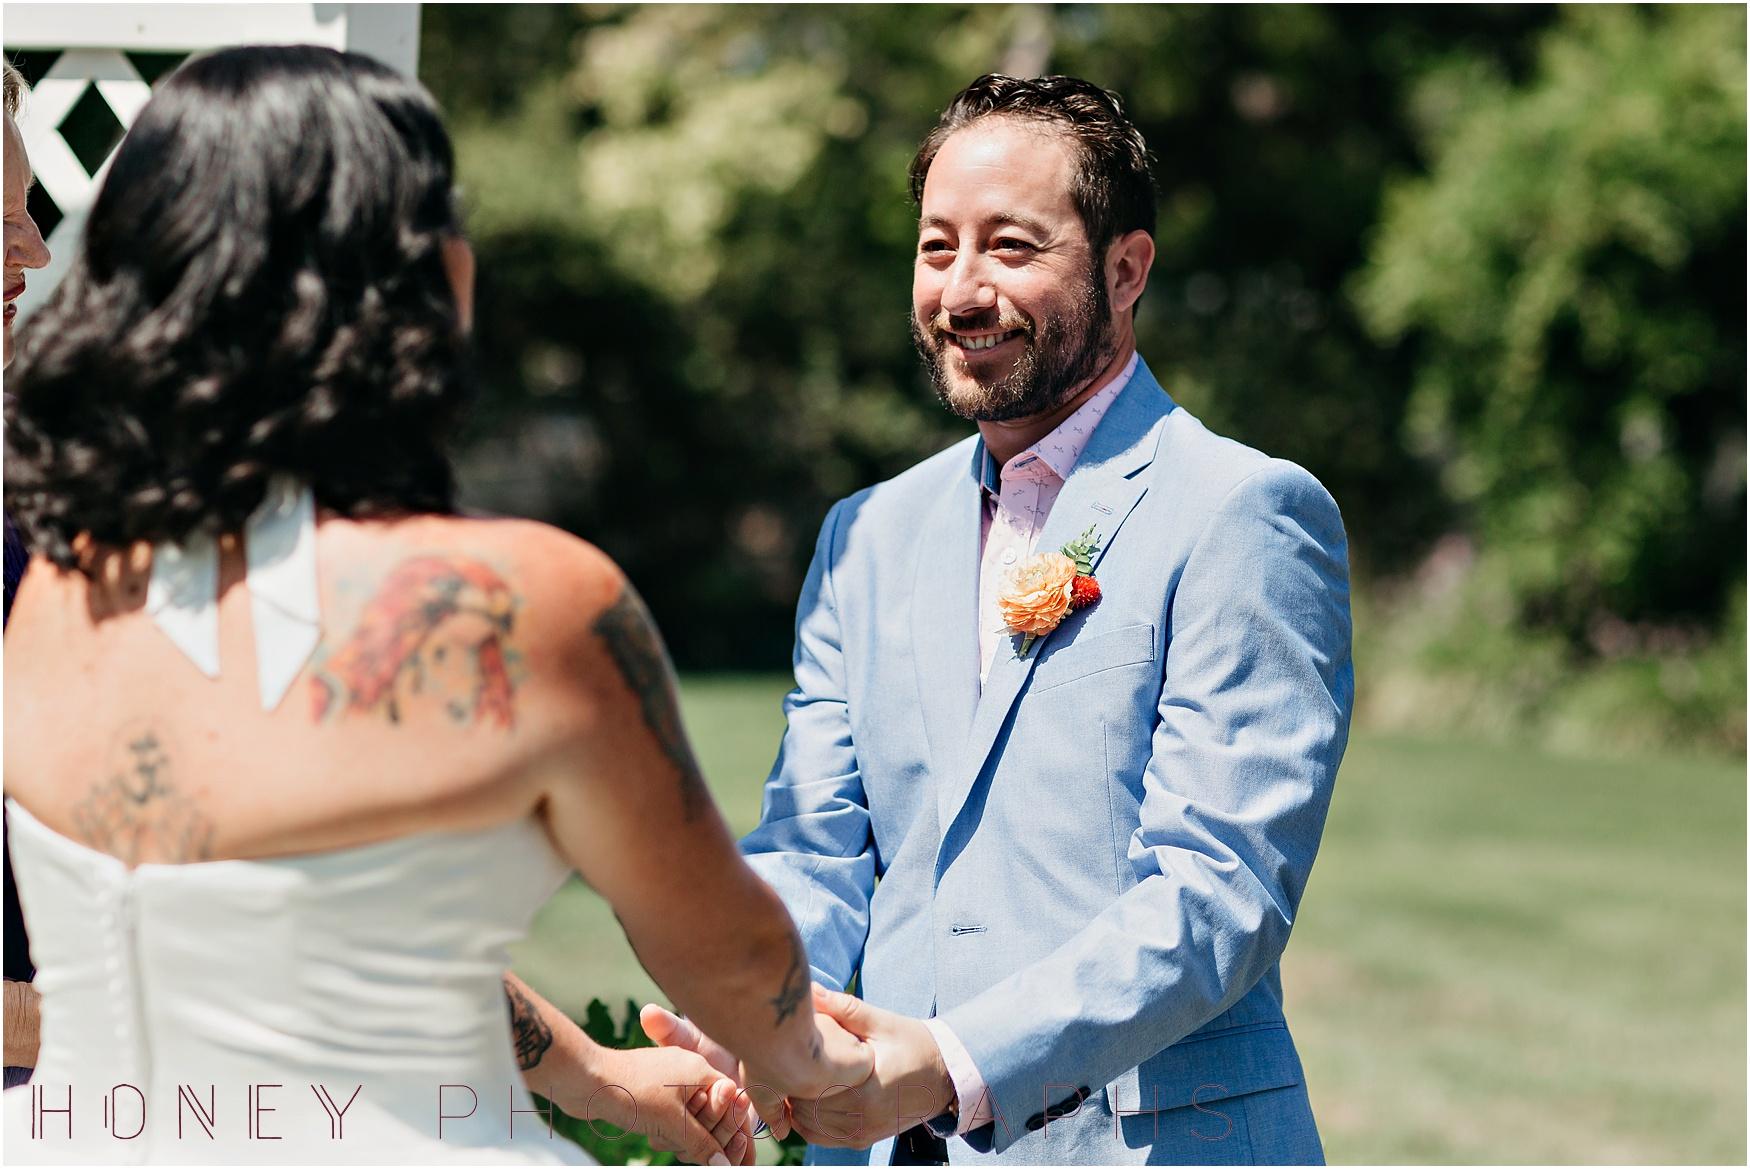 colorful_ecclectic_vibrant_vista_rainbow_quirky_wedding020.jpg